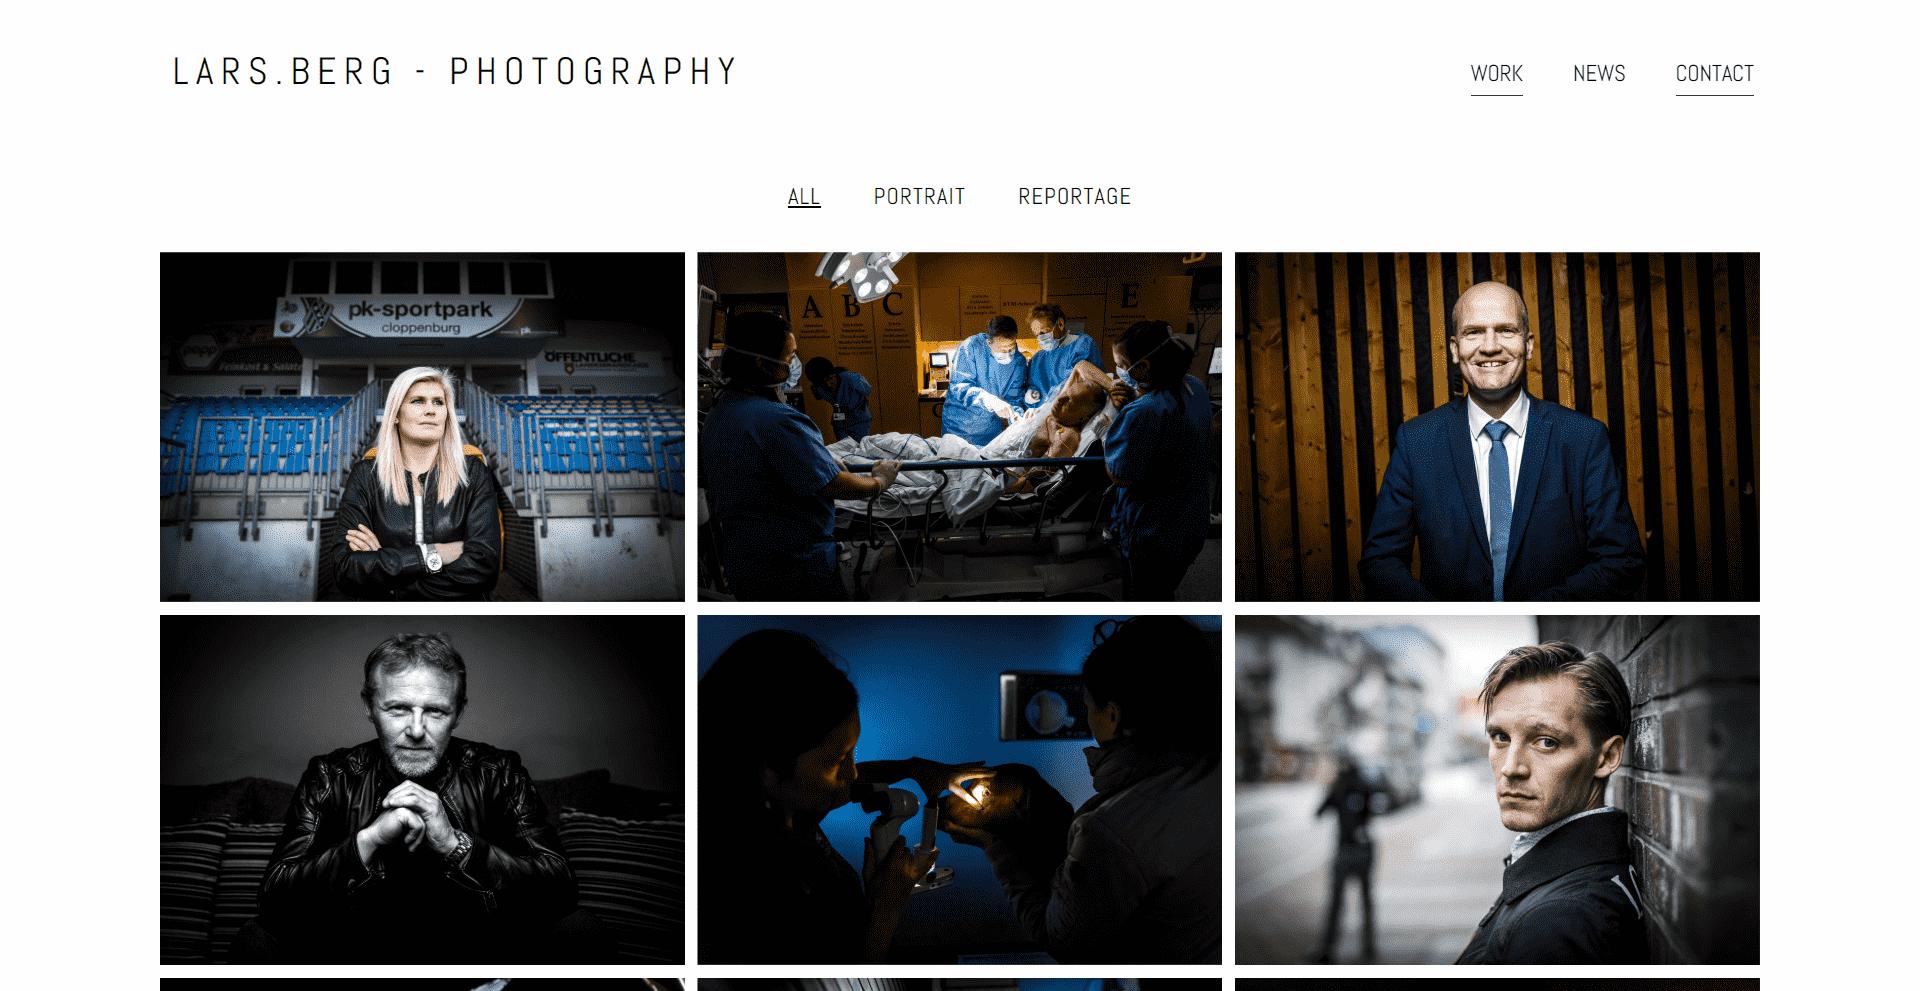 Lars Berg - Photography - WordPress Webdesign Referenz